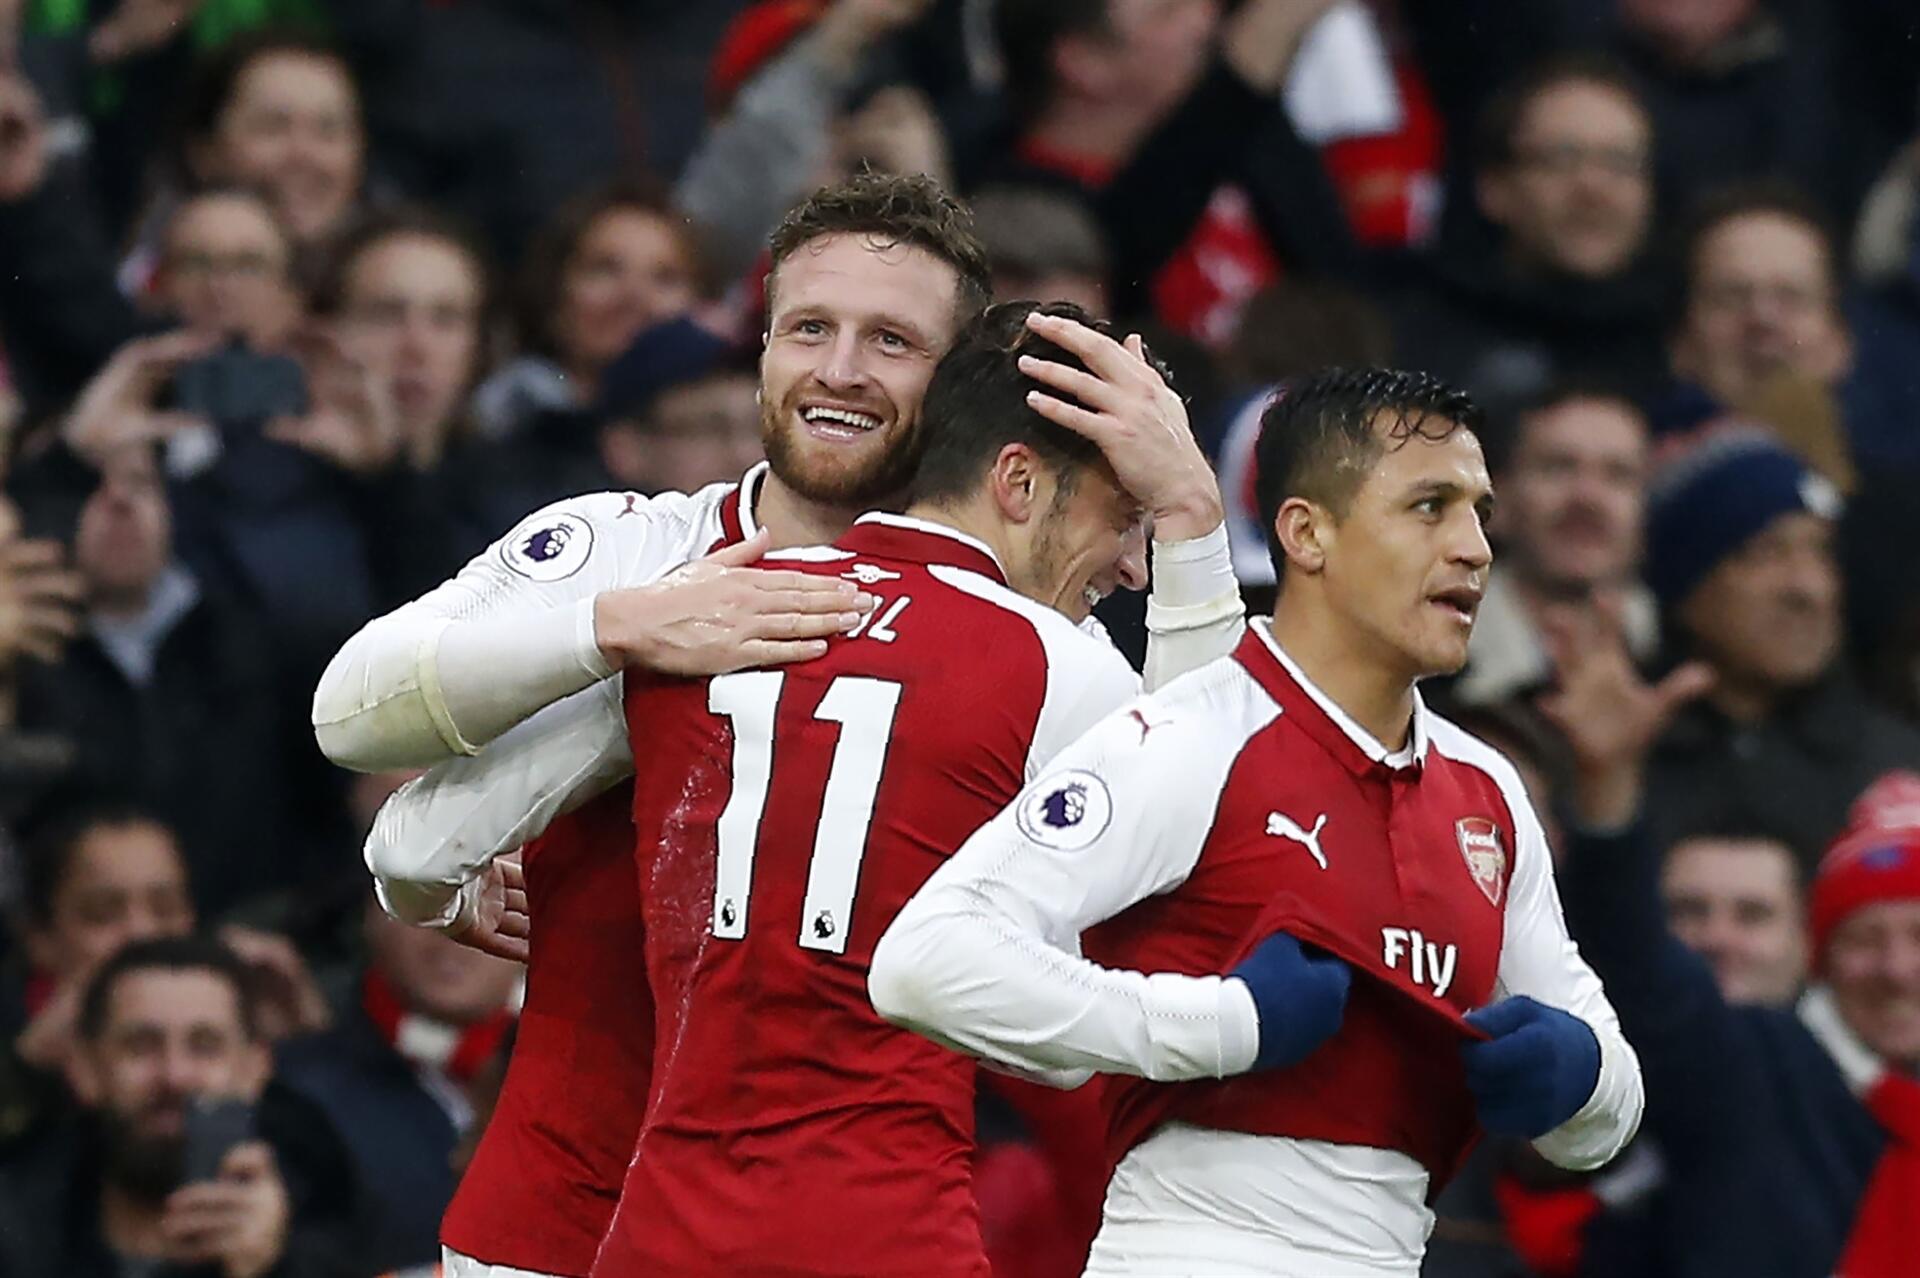 Londra derbisinde Arsenal zaferi